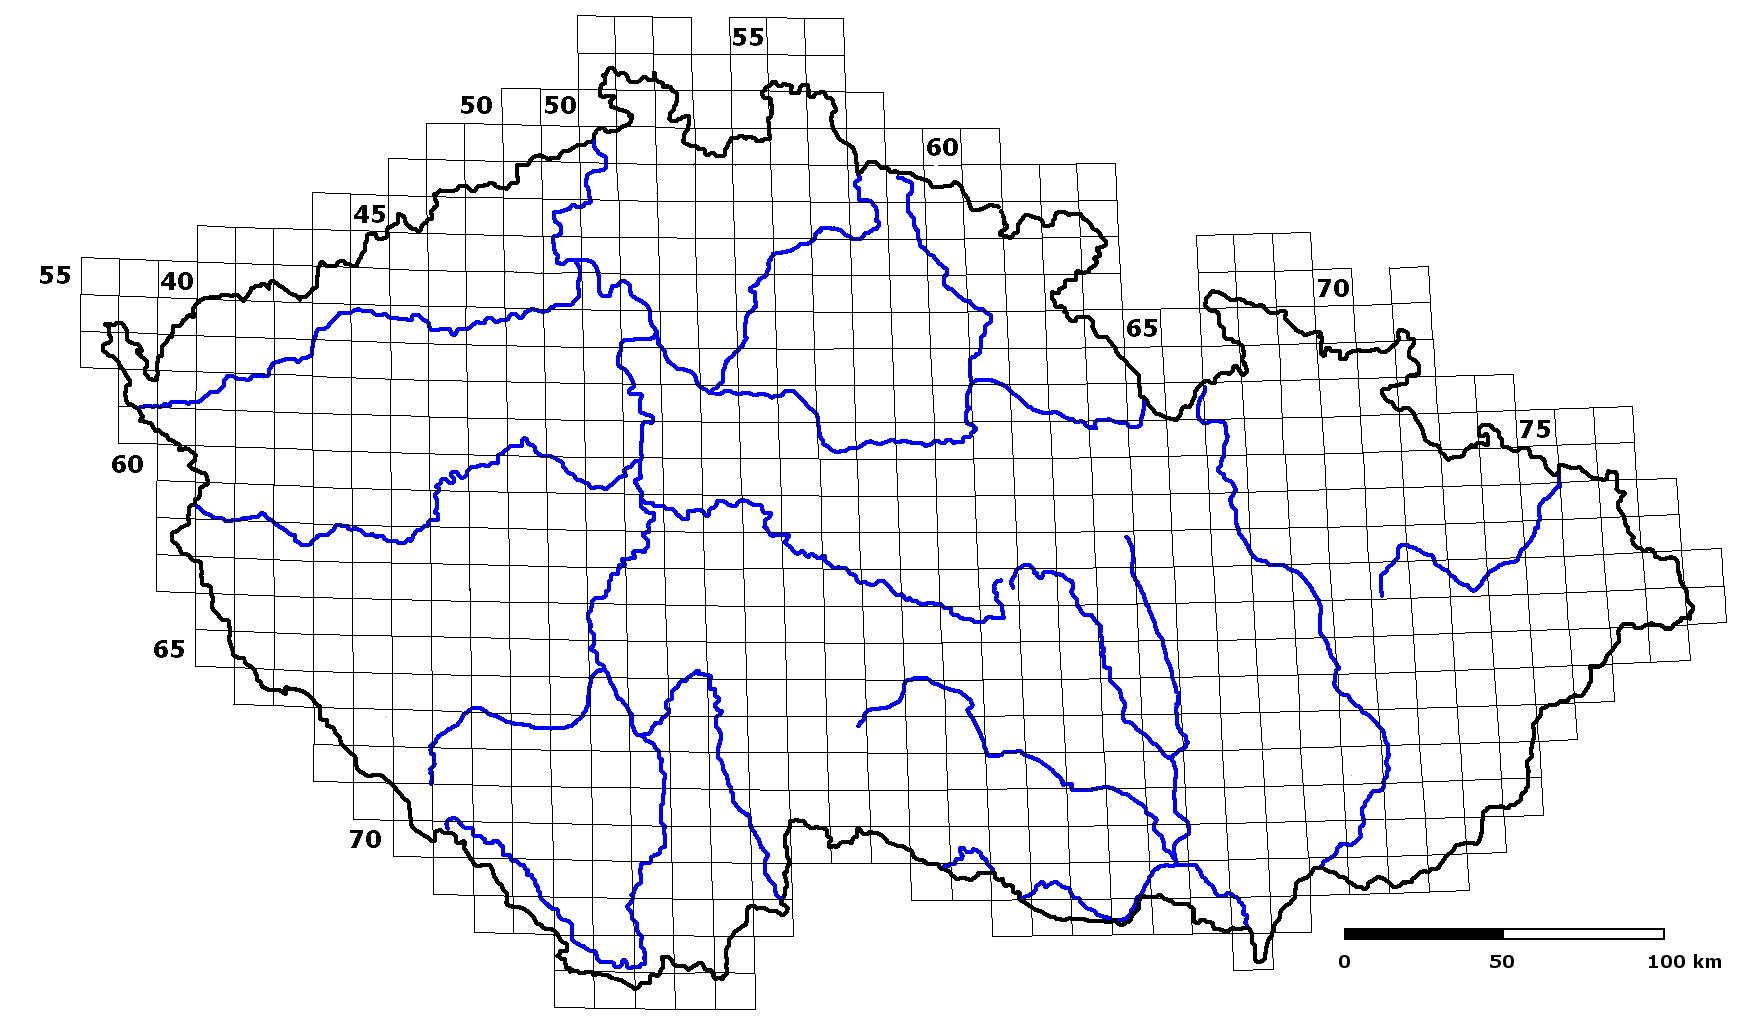 Fileczech republic species distribution map grid blankg wikipedia fileczech republic species distribution map grid blankg gumiabroncs Gallery